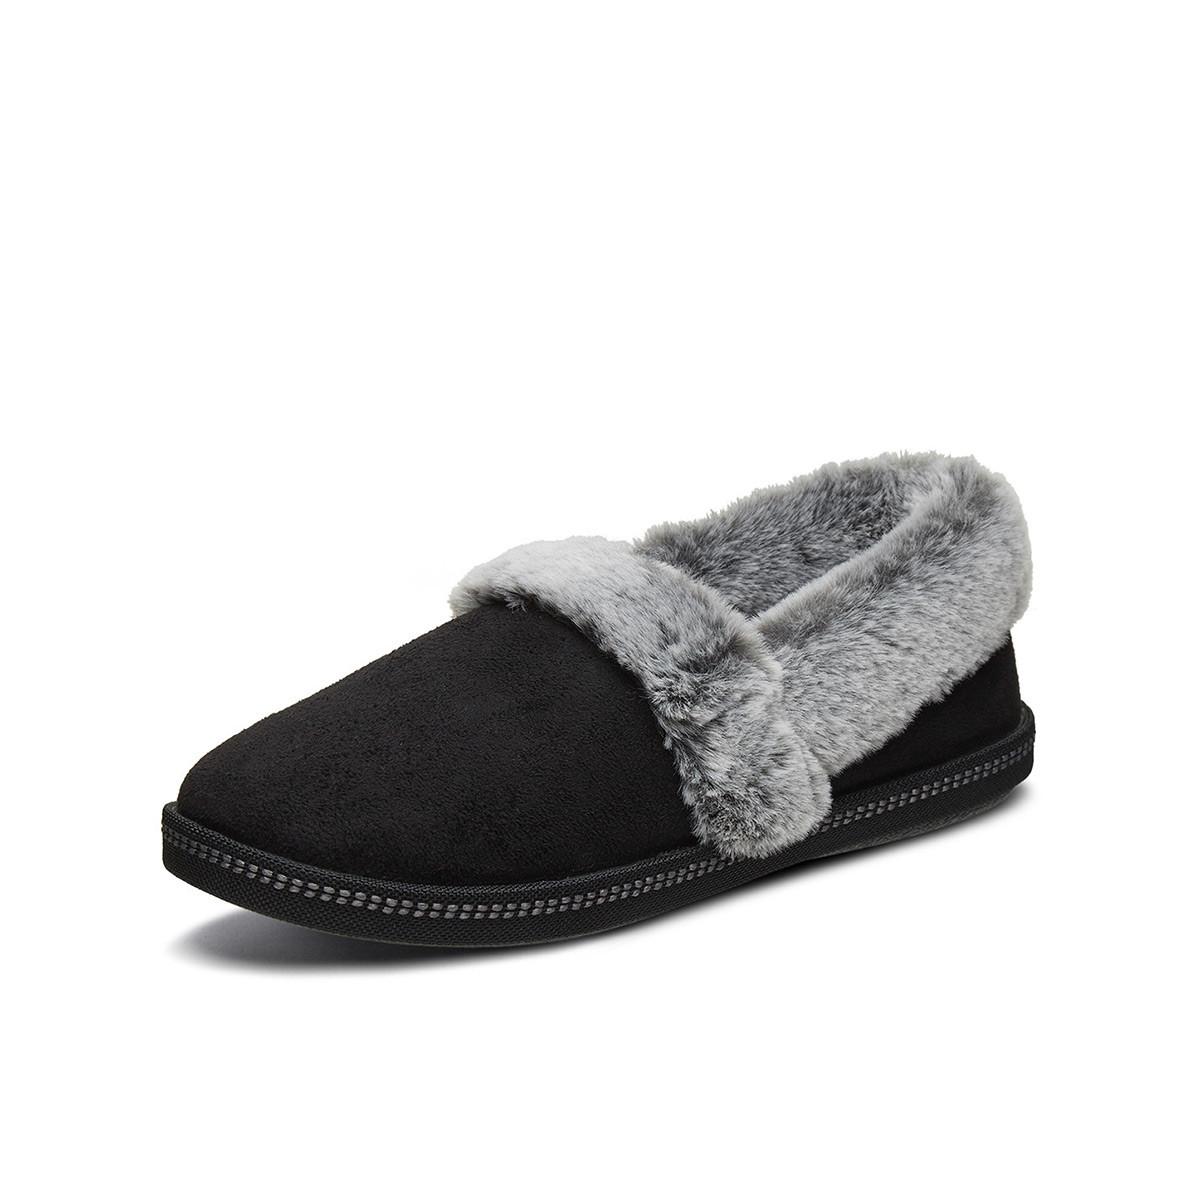 SKECHERS 斯凯奇 32777-BLK  女士棉鞋